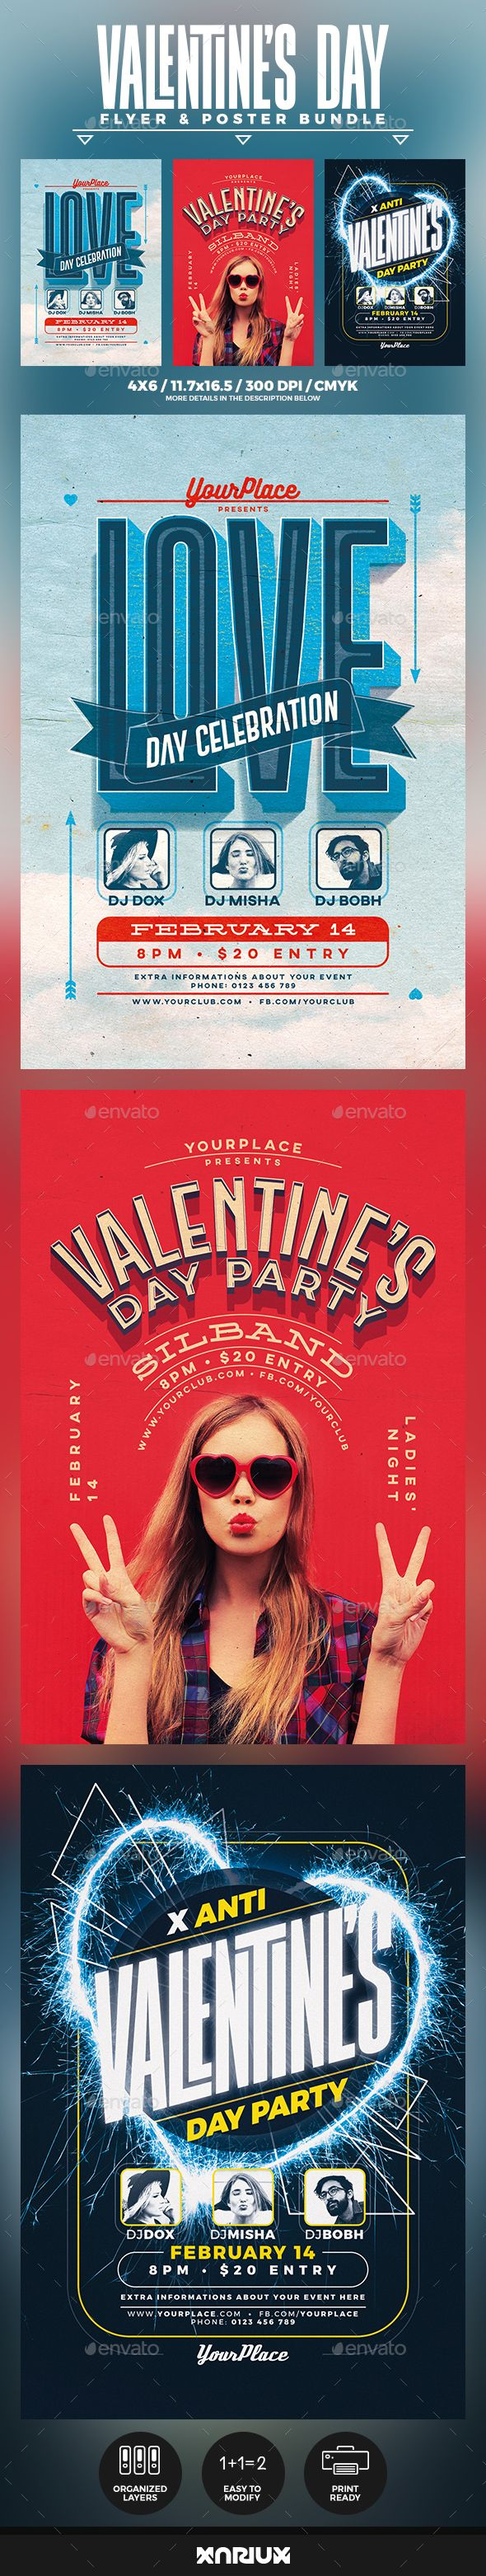 Valentine's Day Flyer and Poster Bundle #valentine #love • Download ➝ https://graphicriver.net/item/valentines-day-flyer-and-poster-bundle/21351390?ref=pxcr